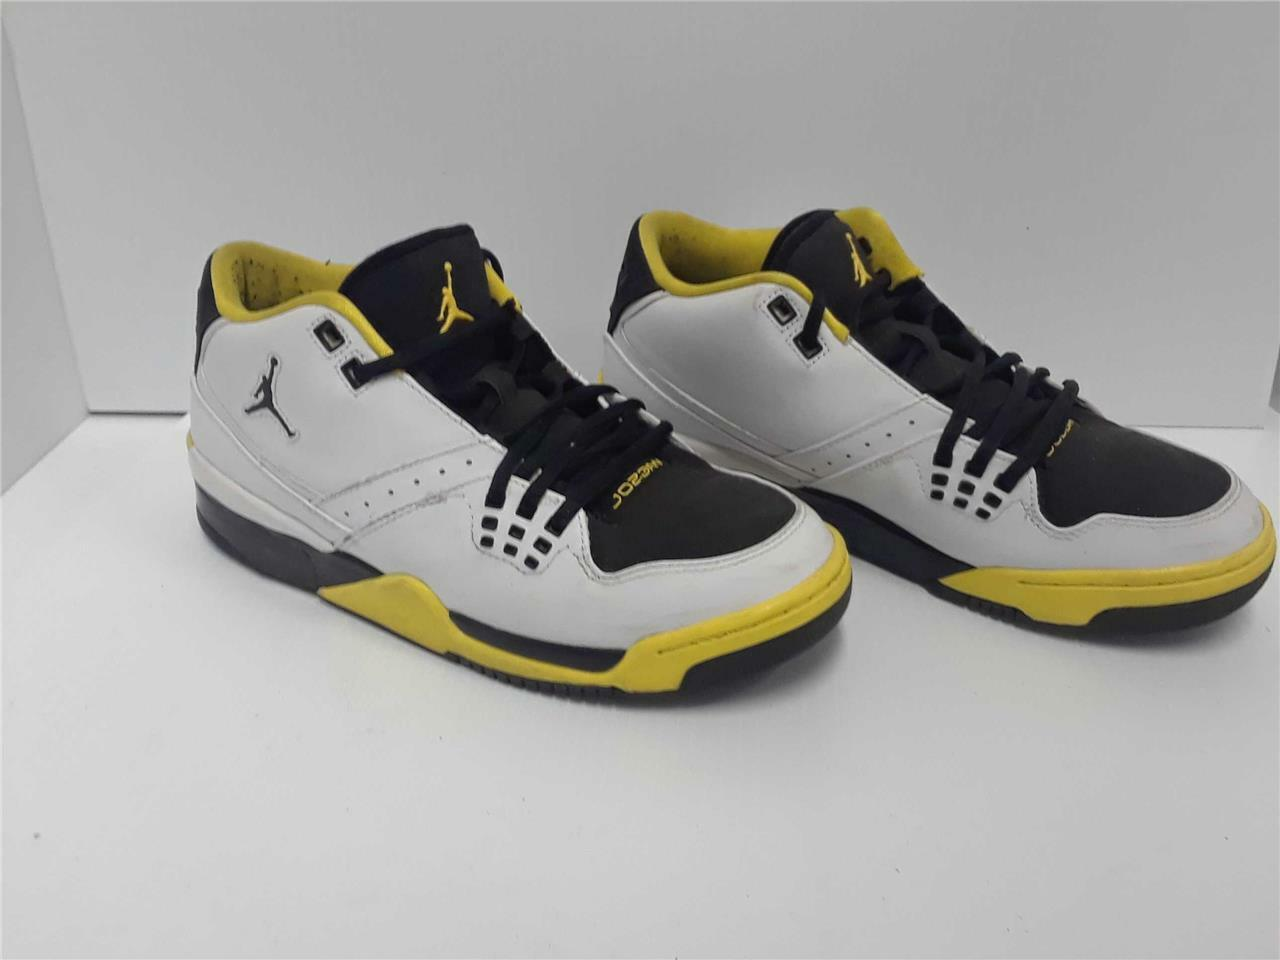 Nike Air Jordan Flight 23 Amarillo para hombres Blanco Negro Amarillo 23 317909102 ef2fed